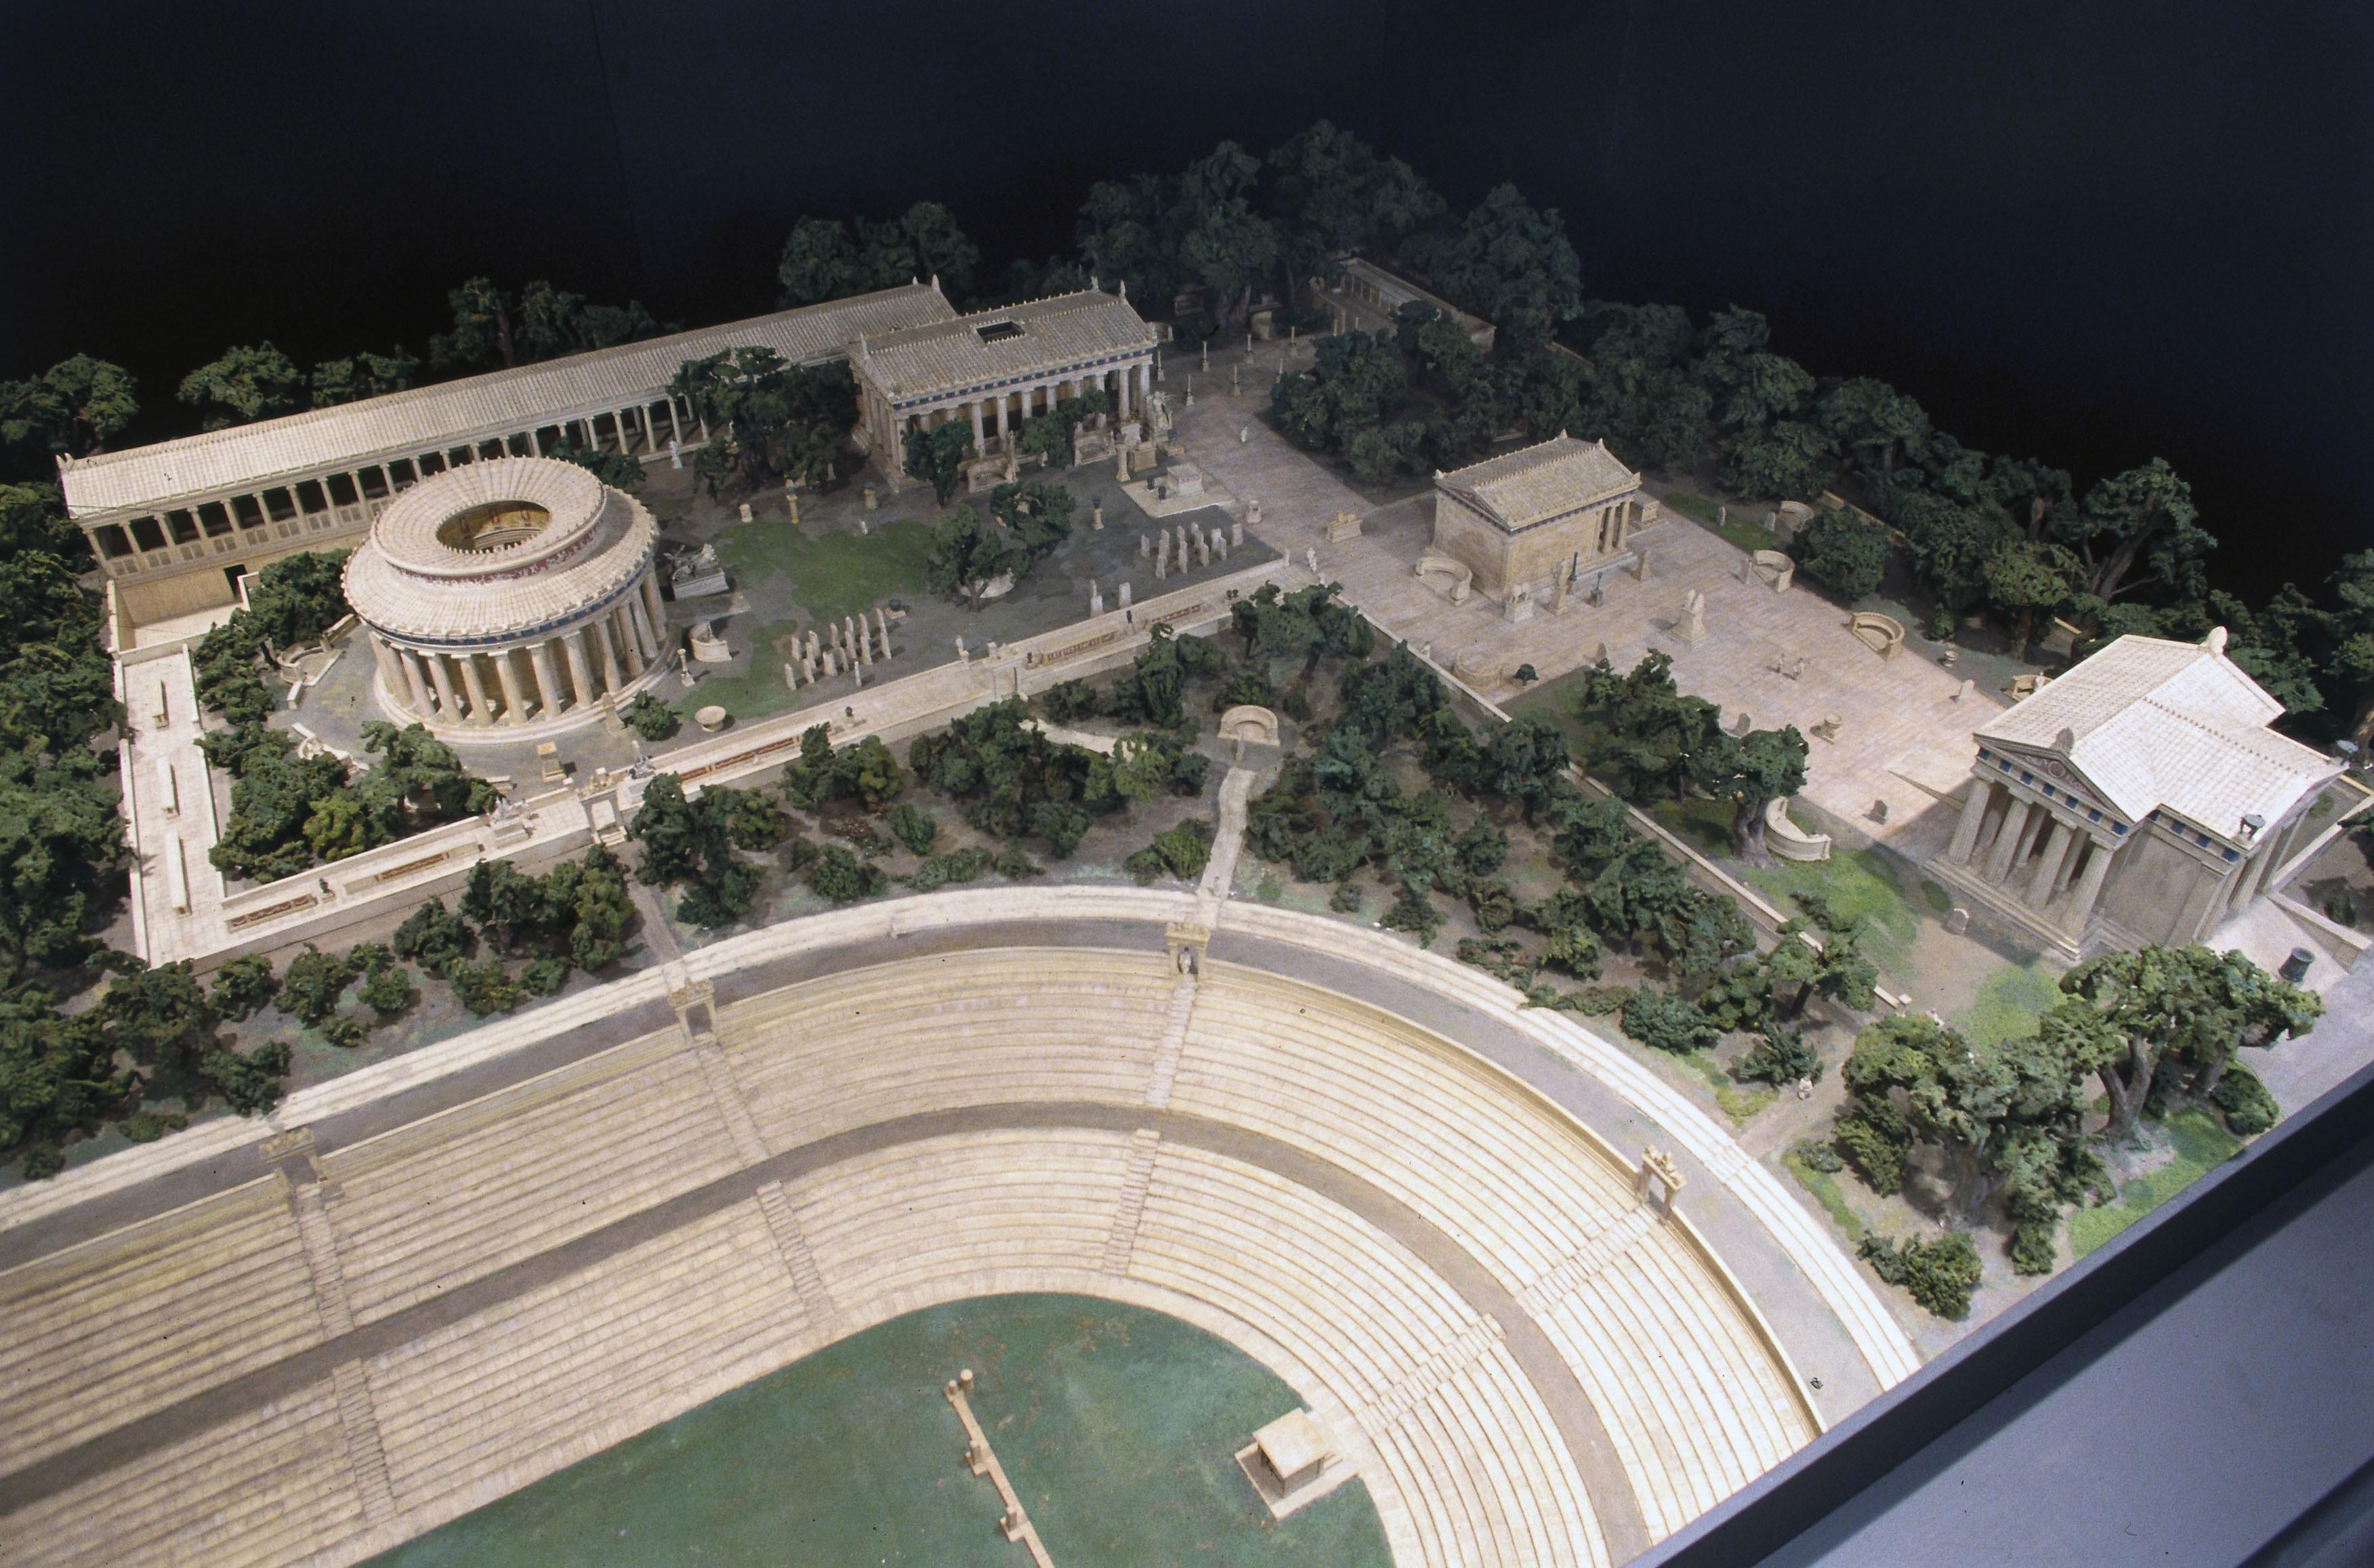 File:Model of the Asklepion at Epidaurus, Greece, 1936 ...